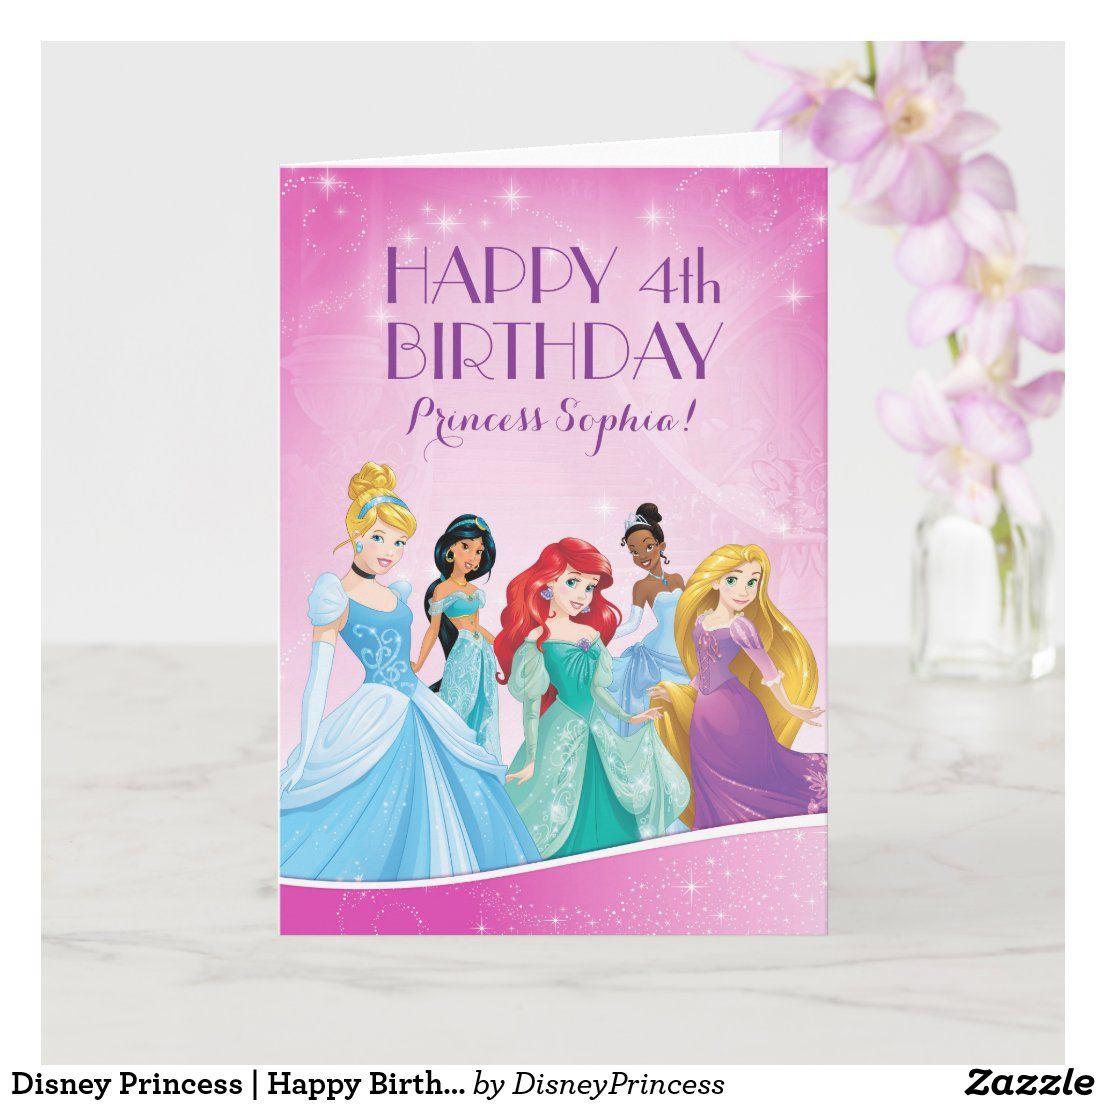 Disney Princess Happy Birthday Card in 2020